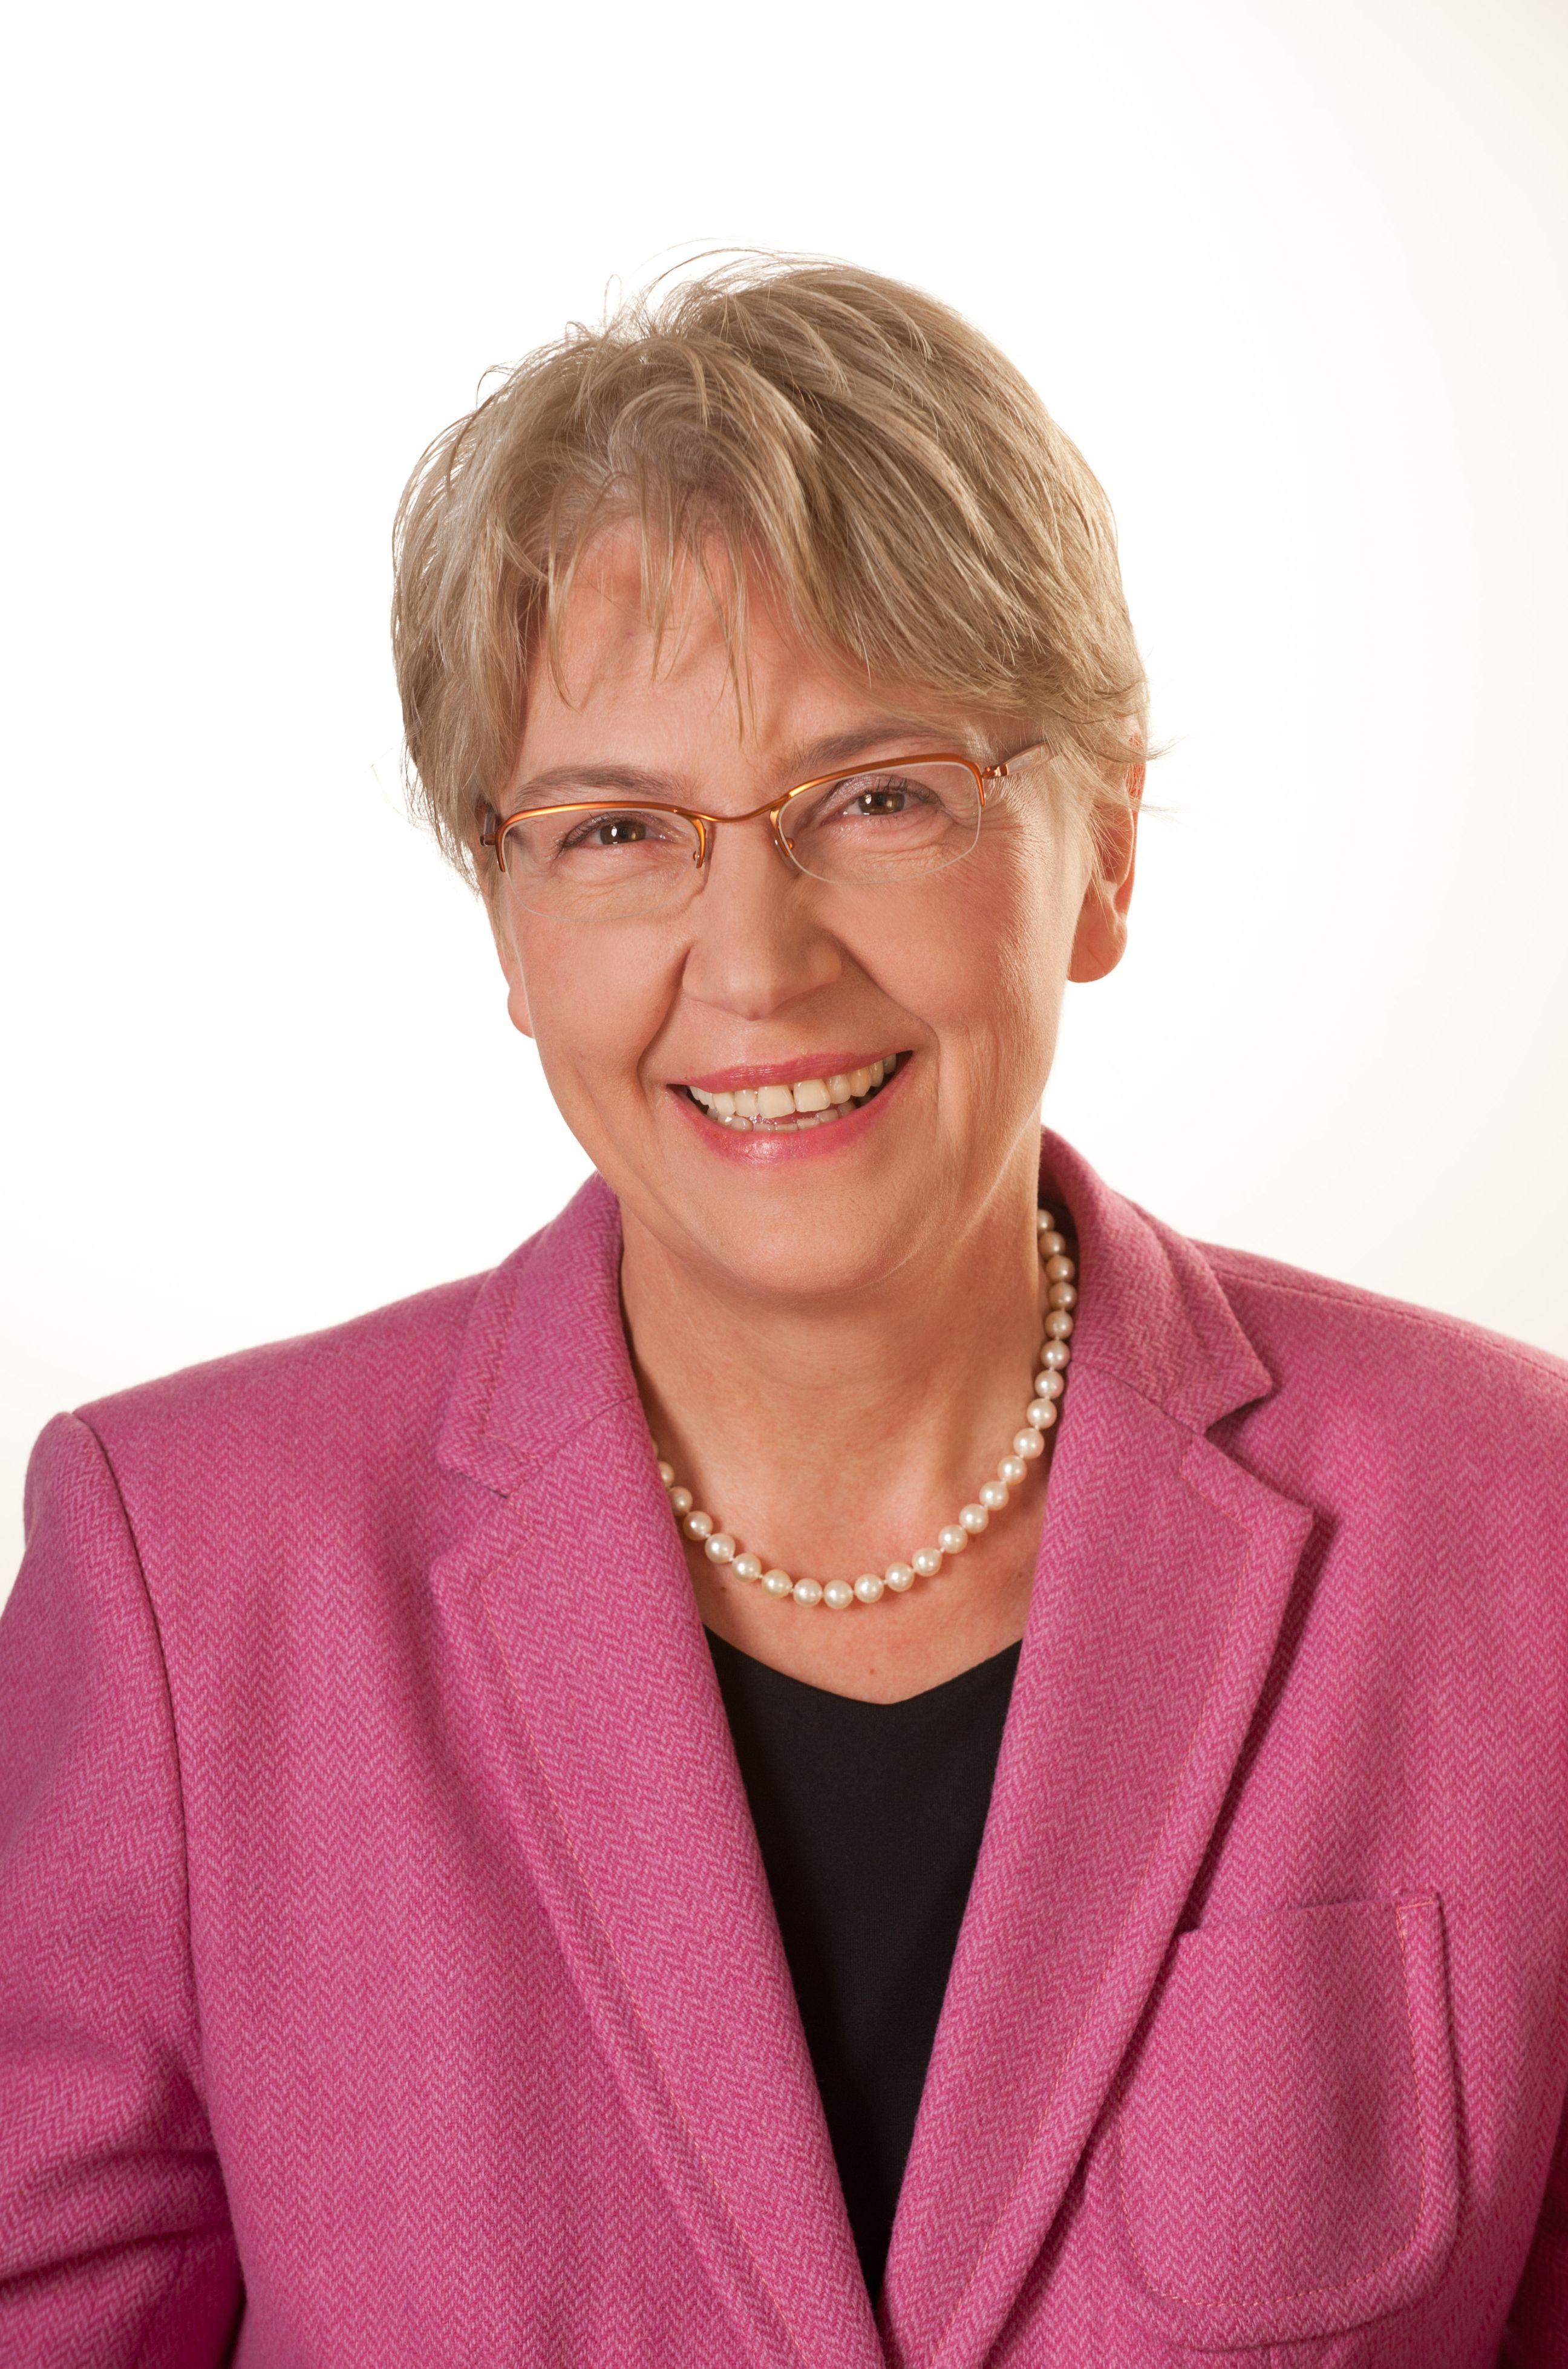 Gerda Weigel-Greilich